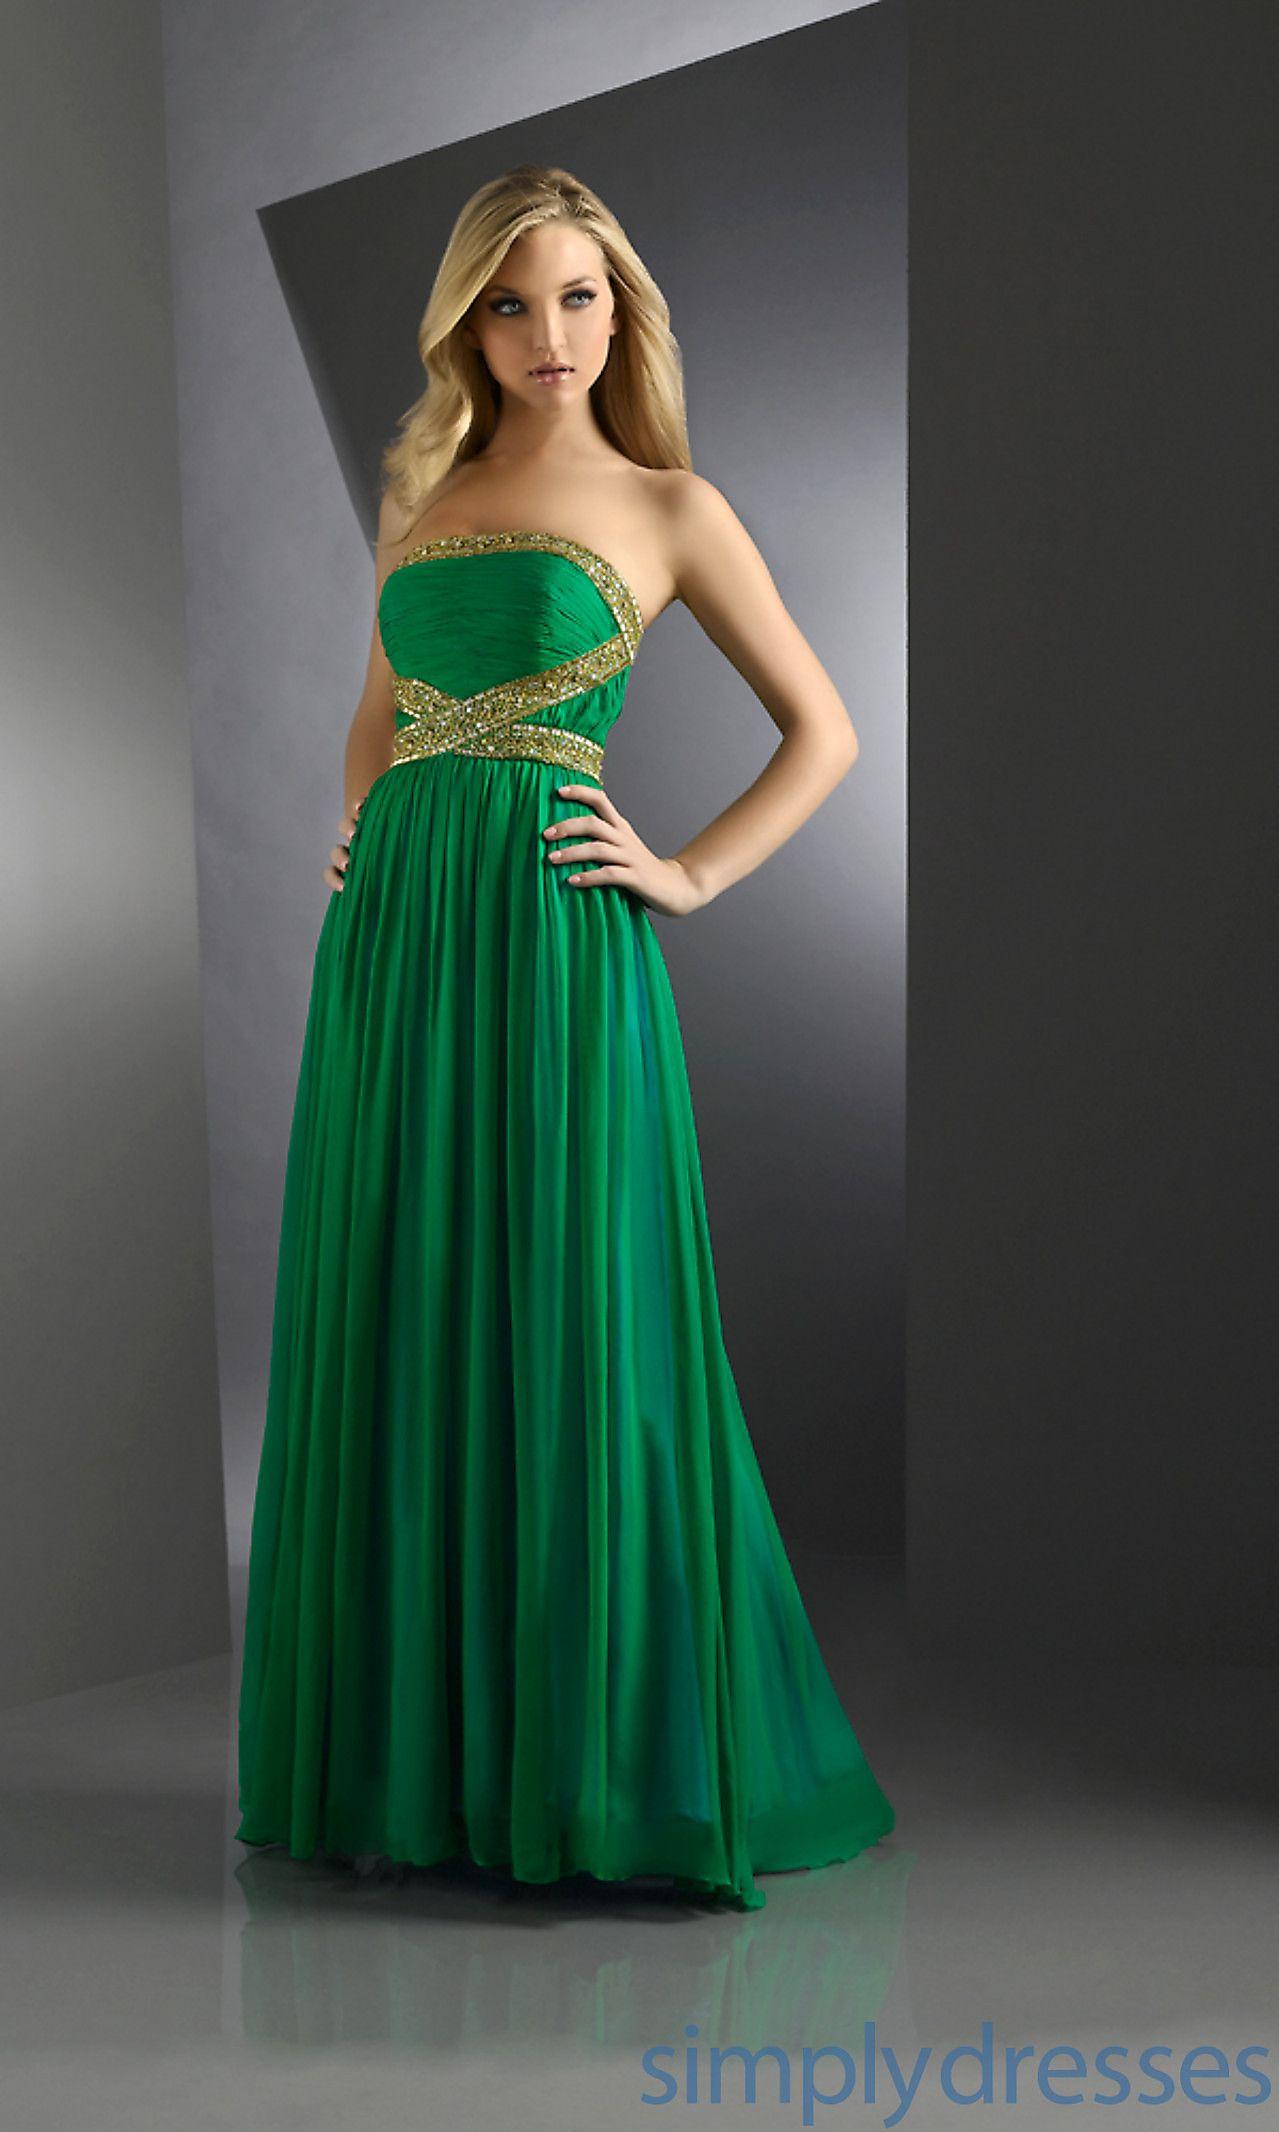 Strapless green flowing dress bjbjv fashion pinterest